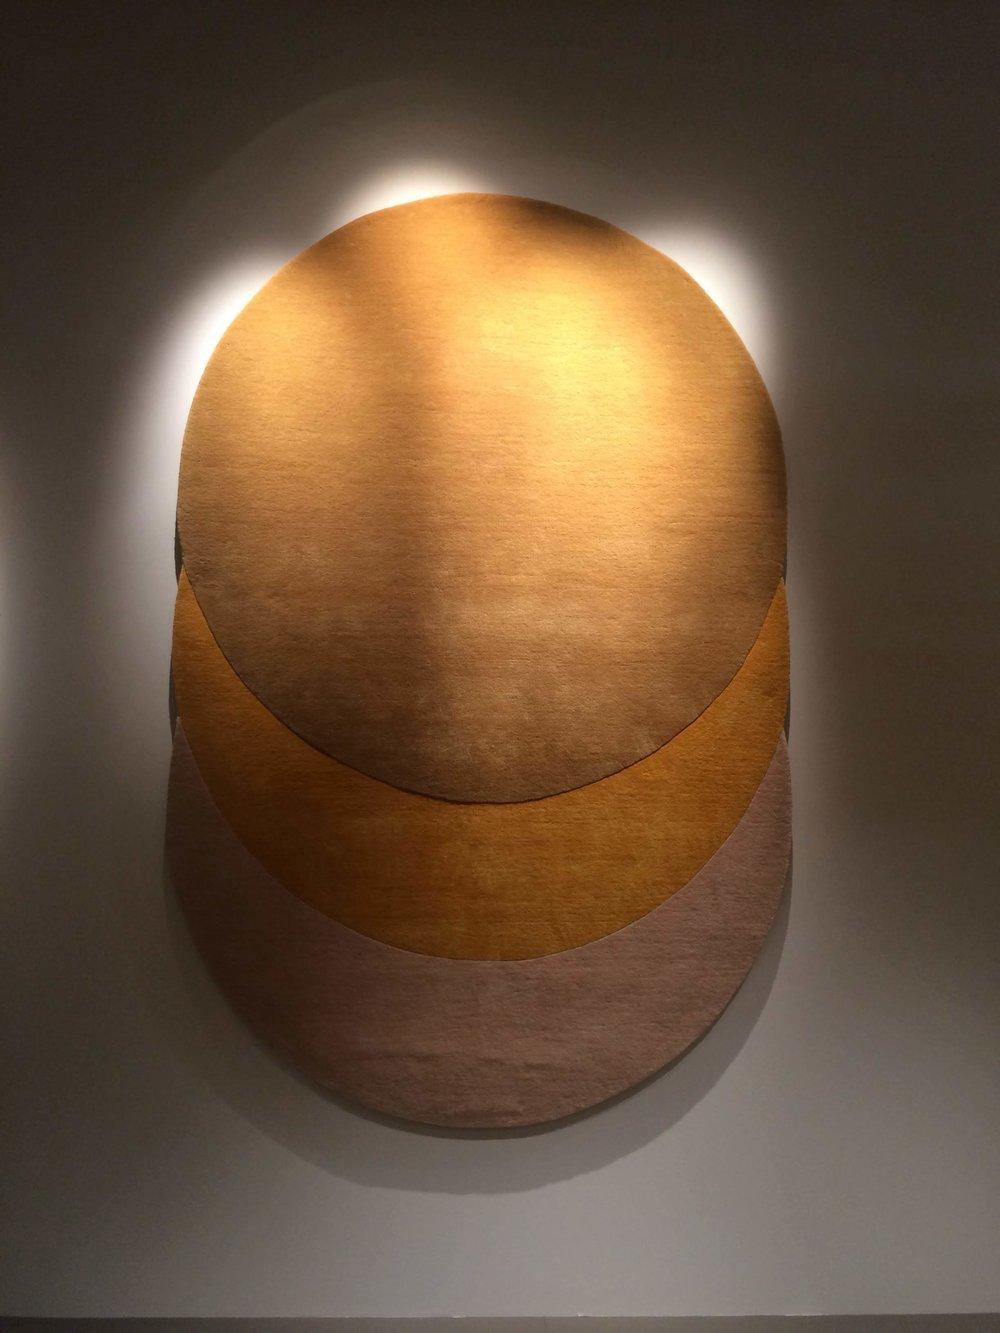 Teorema Circles by Elisa Ossino. AMINI